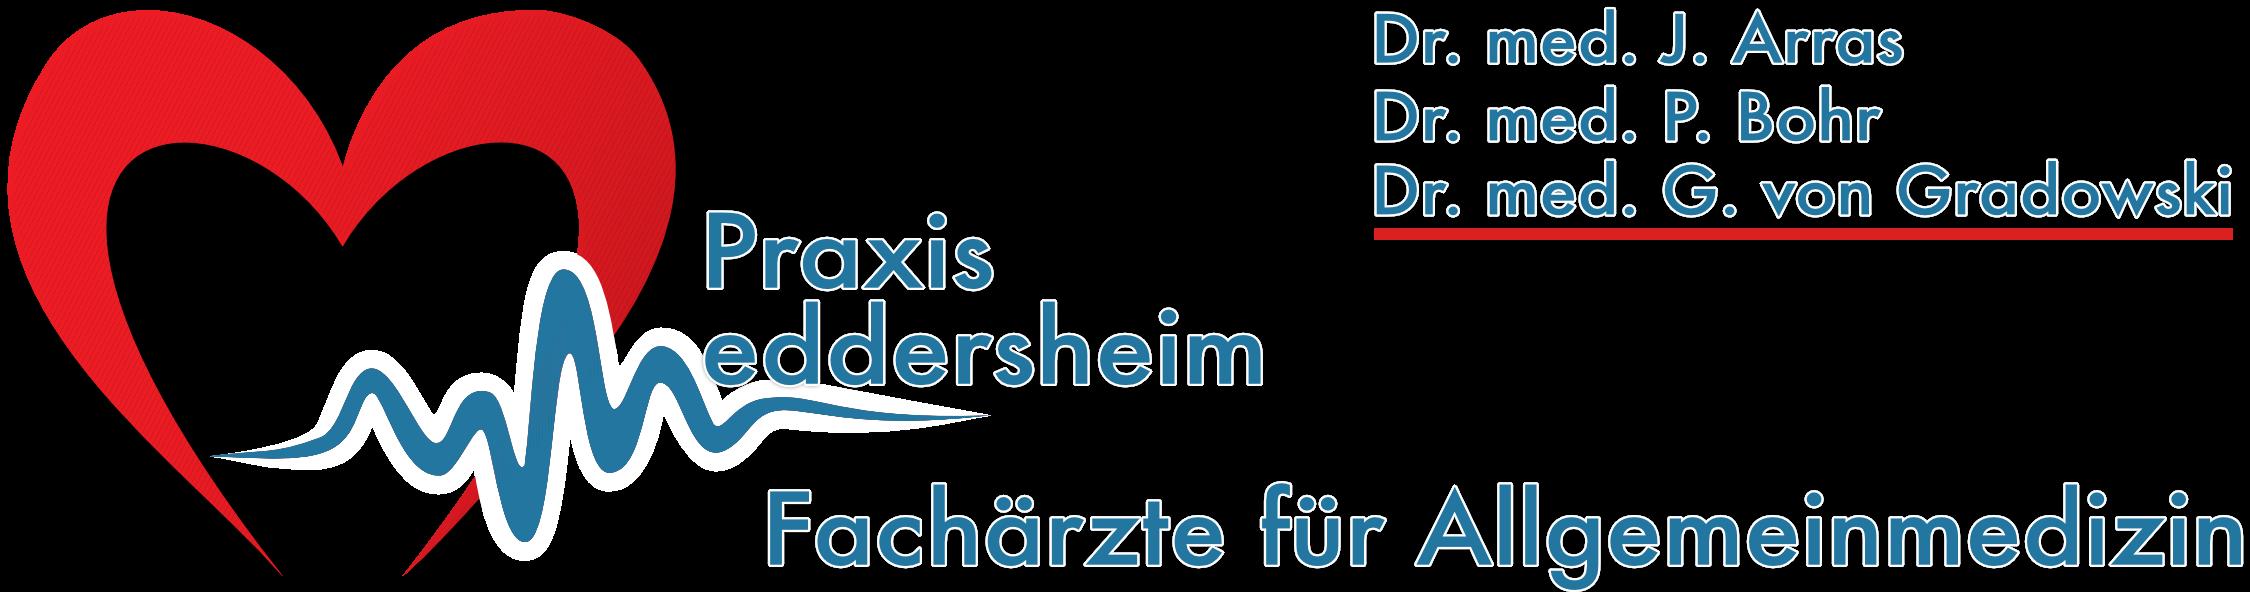 Praxis Meddersheim Logo